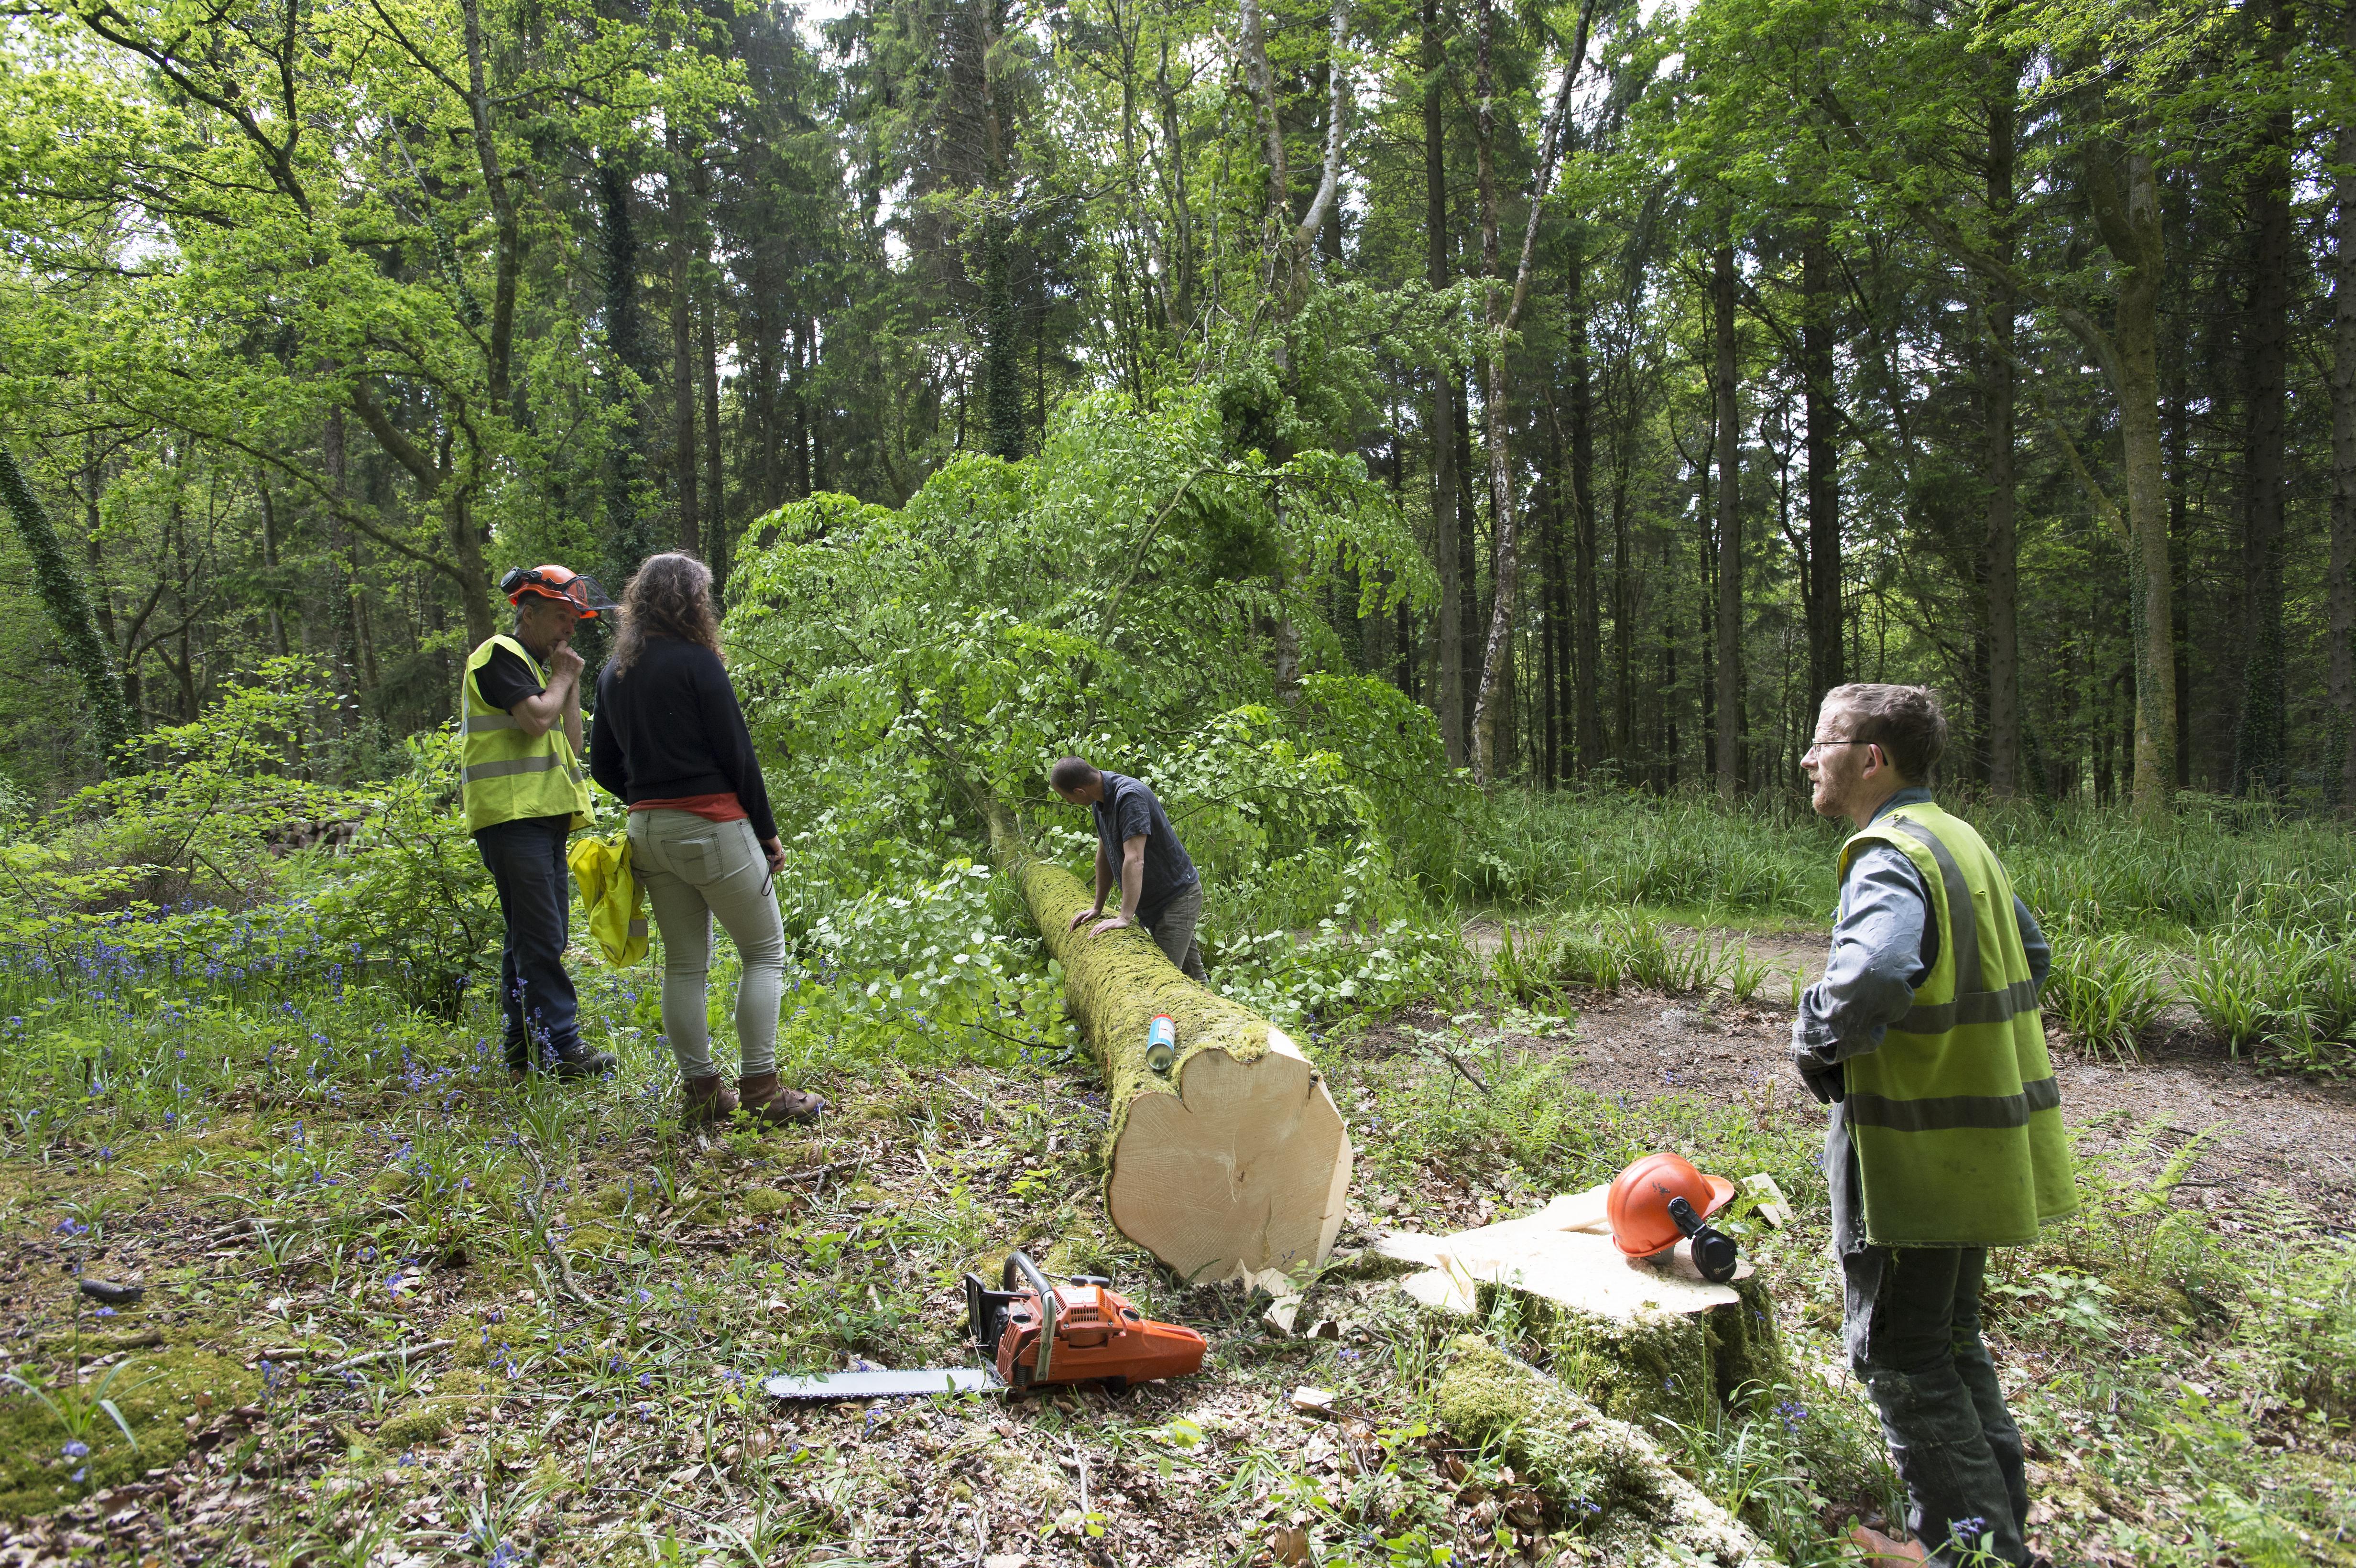 Hooke_Park_Design_&_Make_Timber_Seasoning_Shelter_Group_choosing_&_measuring_trees_VB_2013_06_03_0019.JPG